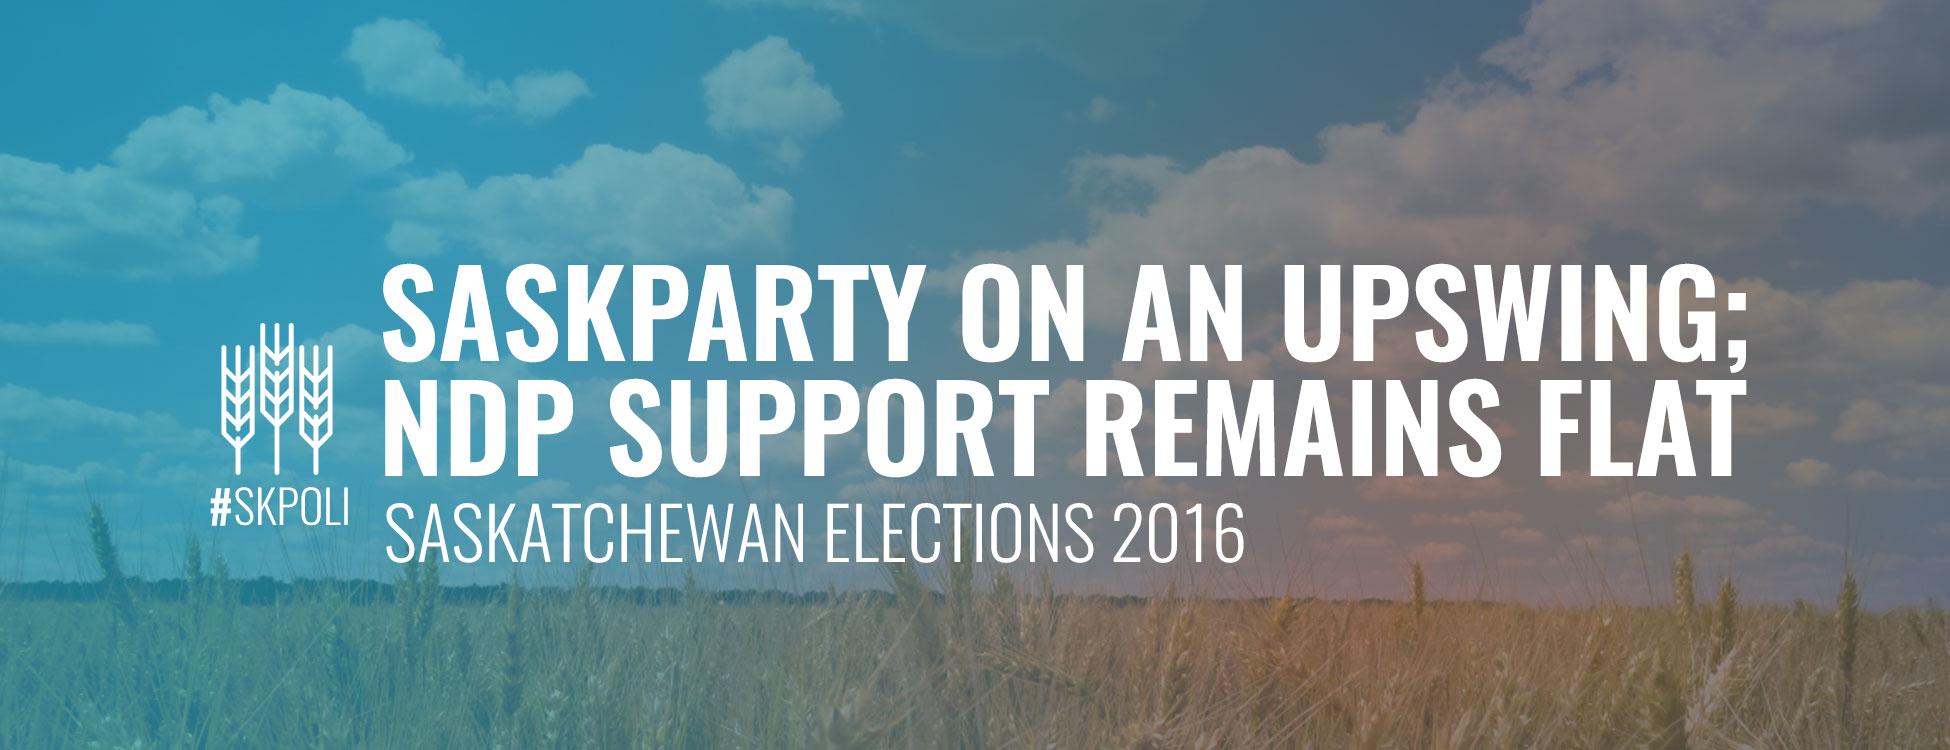 saskatchewan-elections-2016-#skpoli